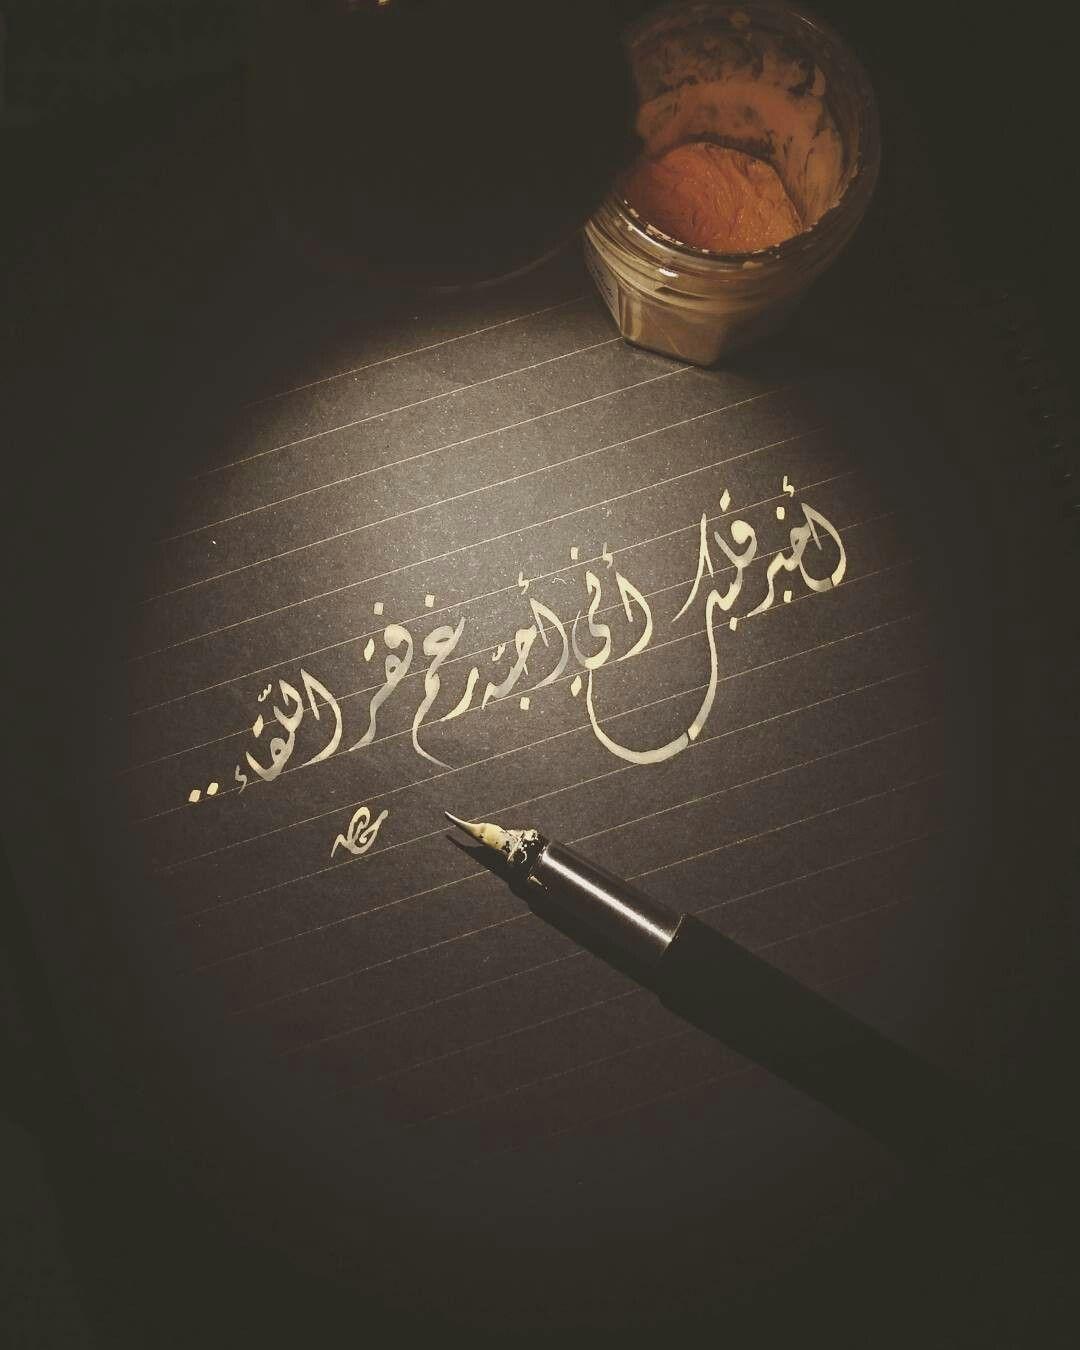 Pin By Islam El Gazar On الخط العربي Romantic Words Arabic Love Quotes Love Words